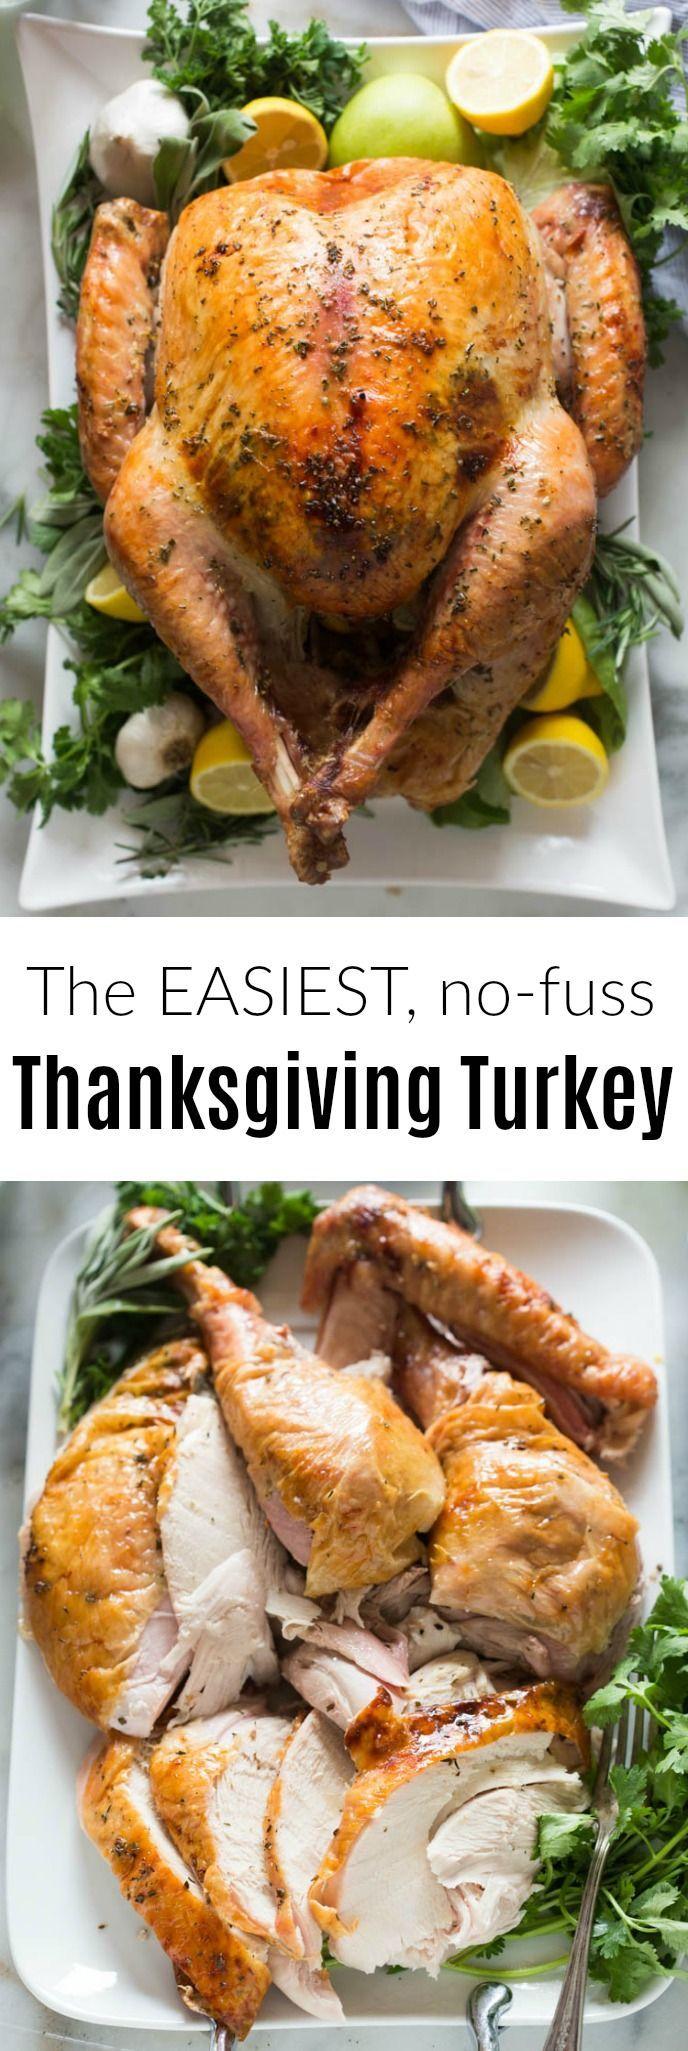 Photo of Easy, No-Fuss Thanksgiving Turkey